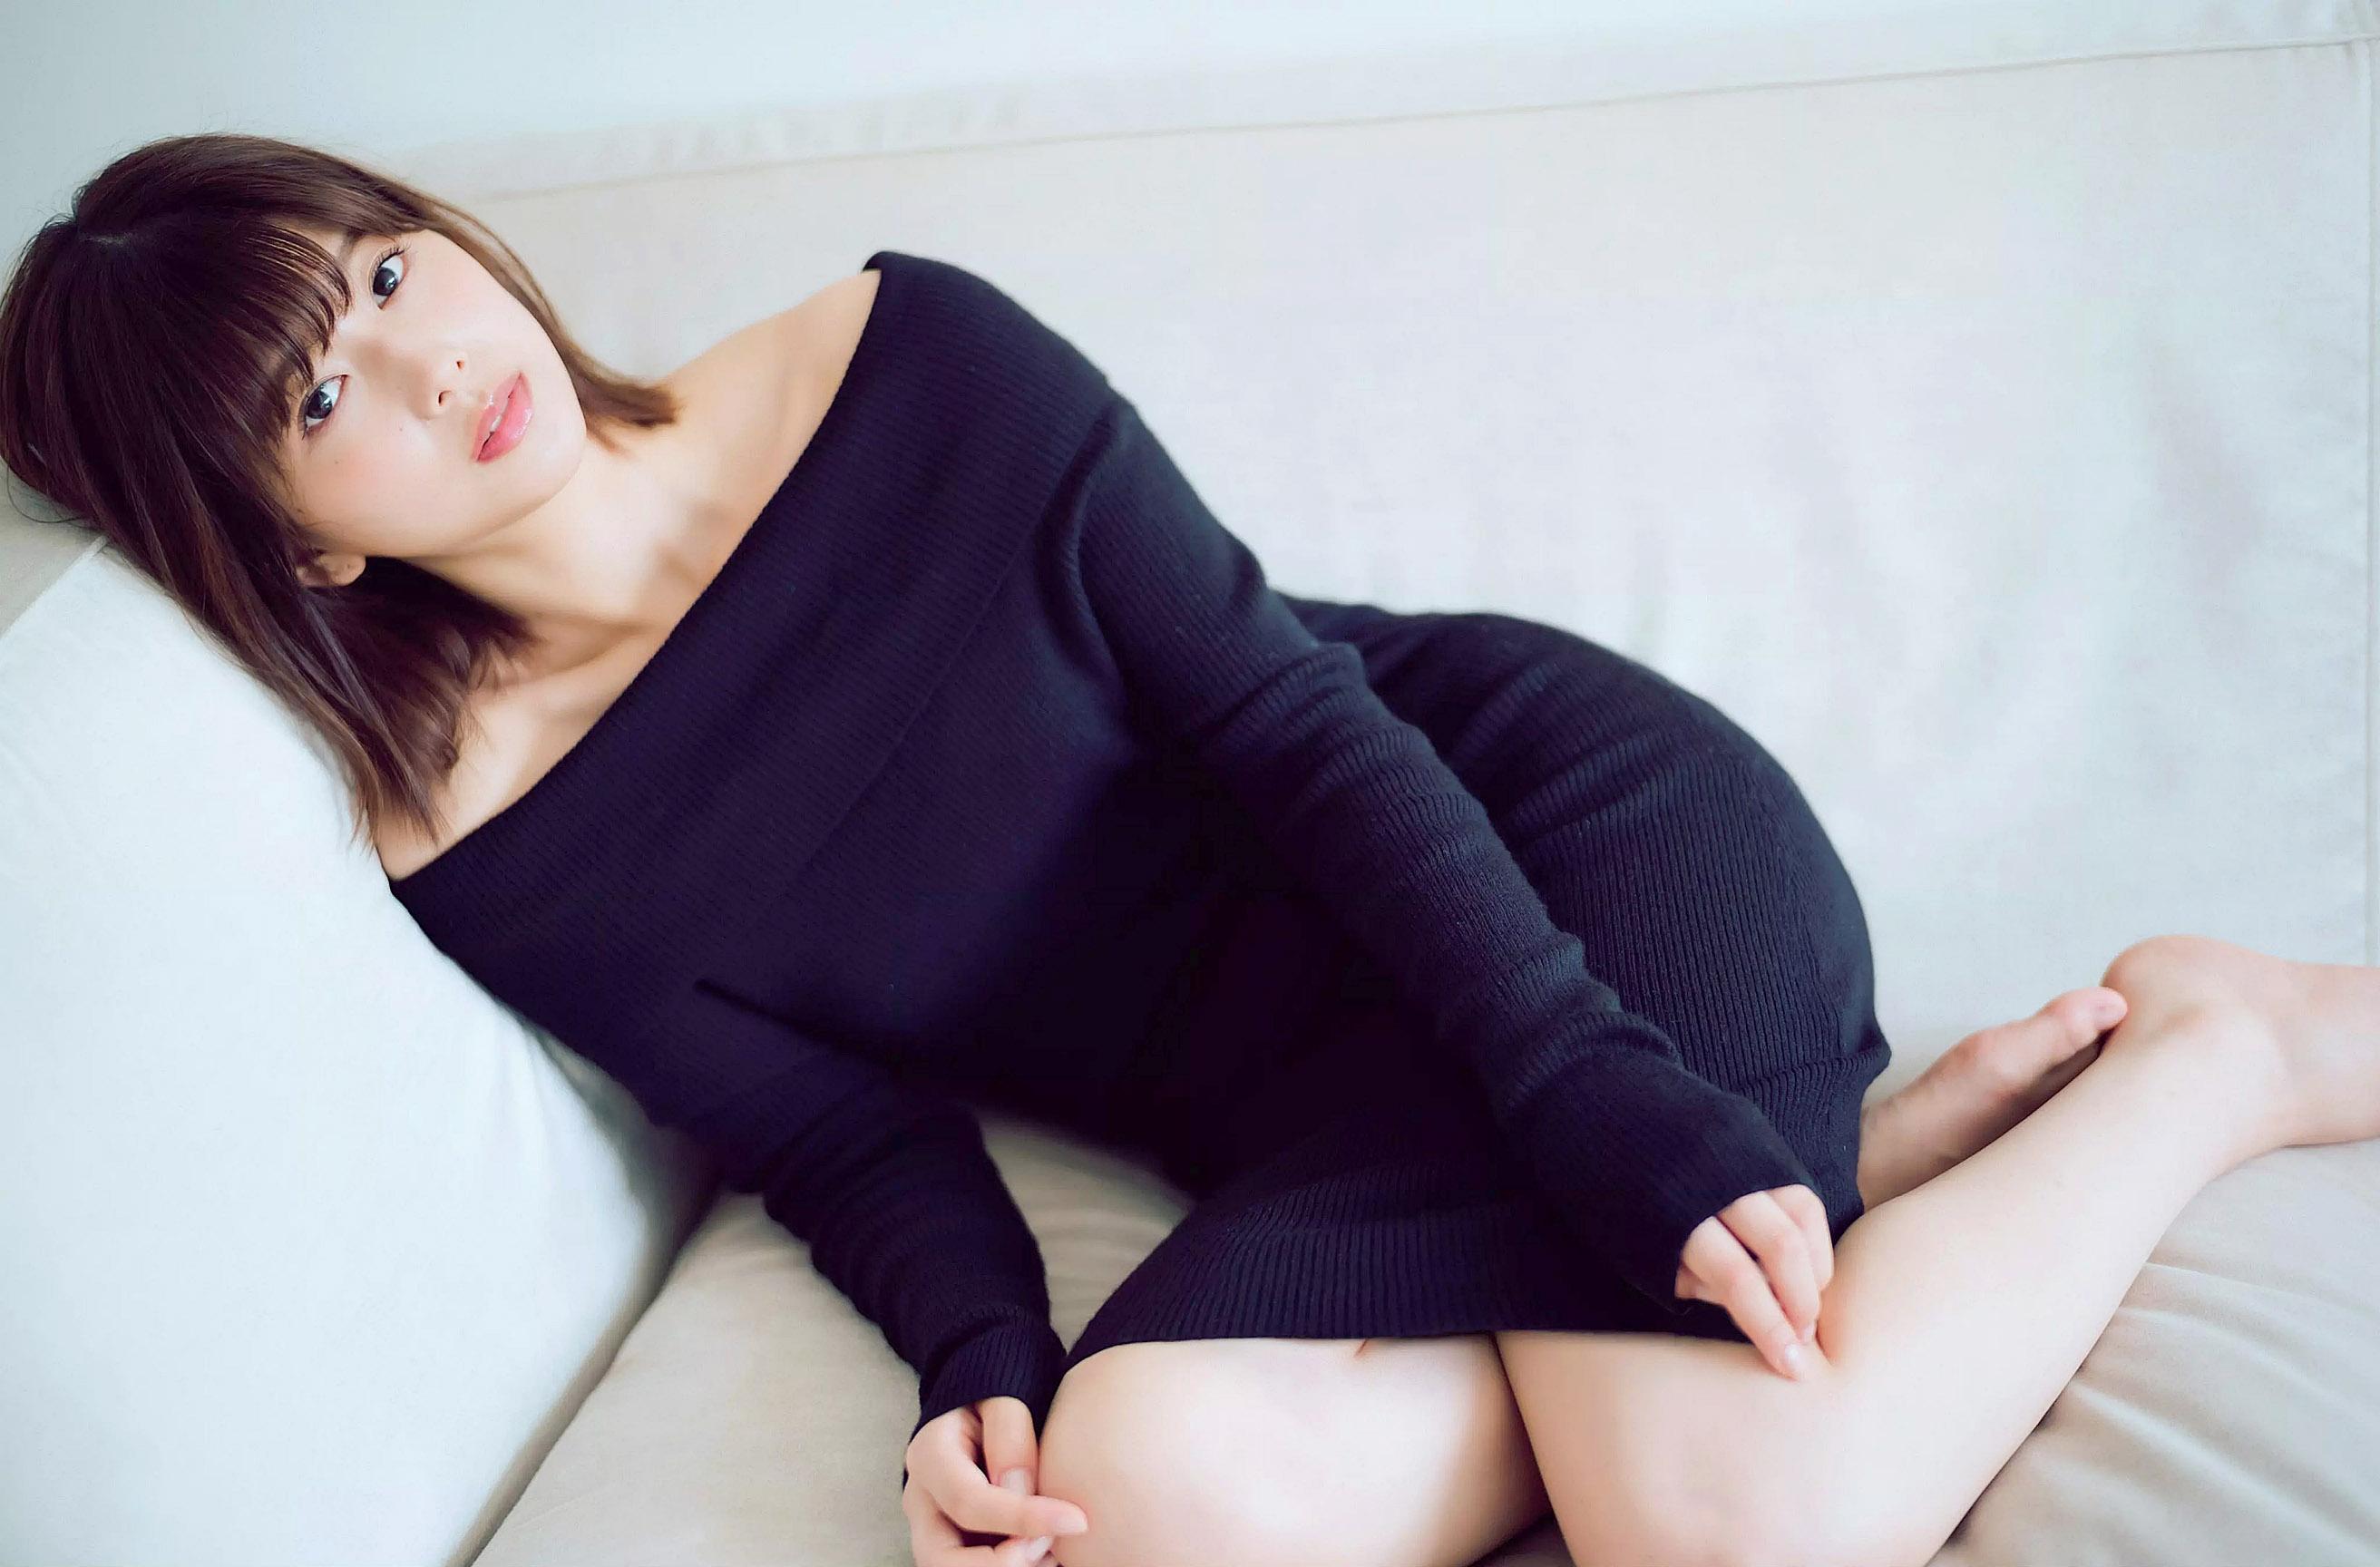 Risa Watanabe Flash 190910 07.jpg